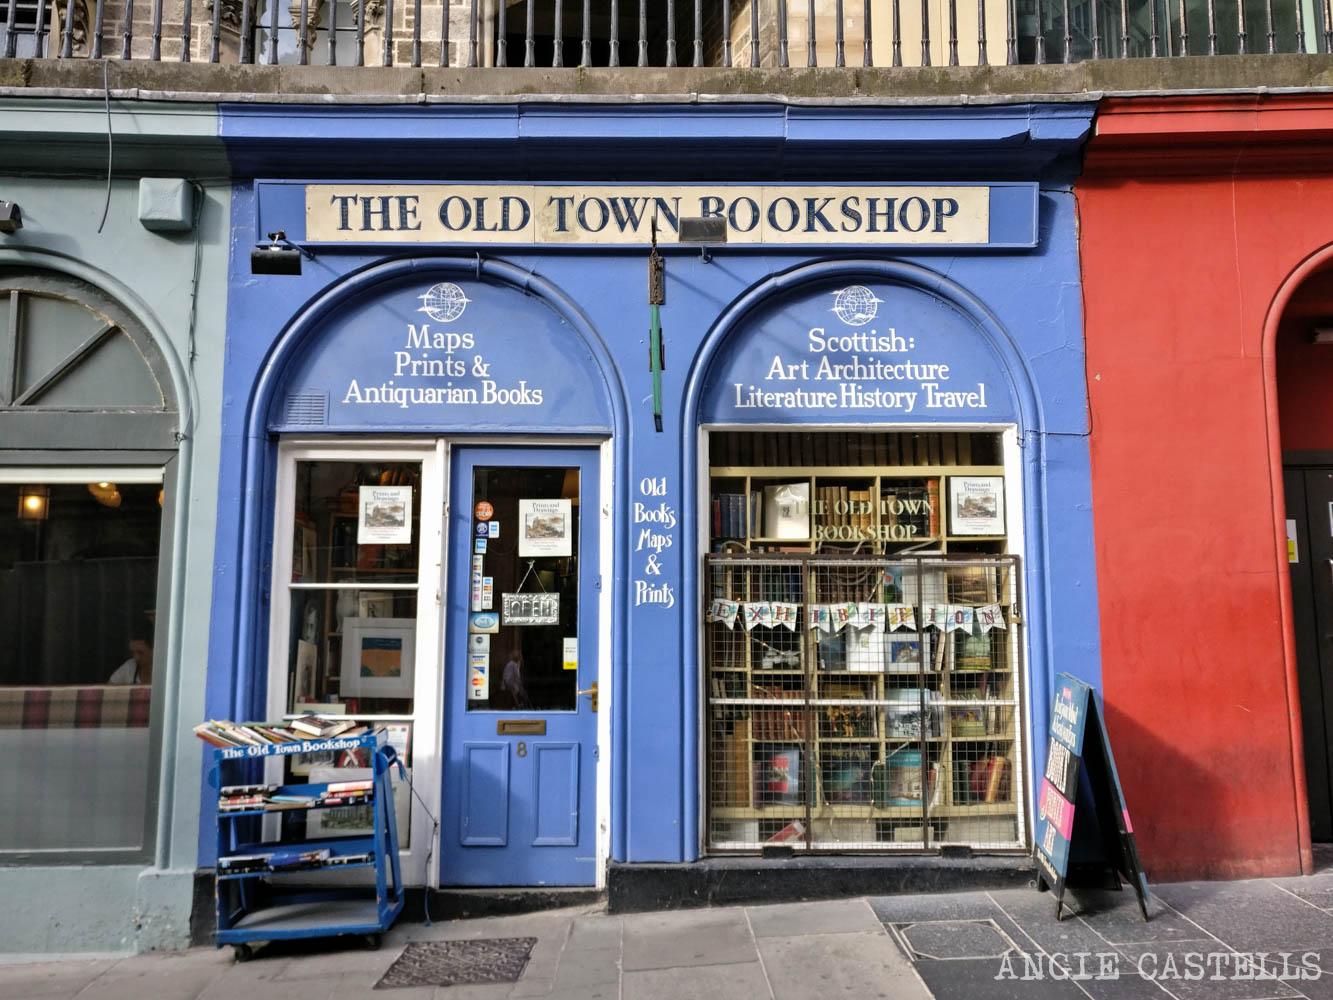 Mejores tiendas Edimburgo regalos originales The Old Town Bookshop